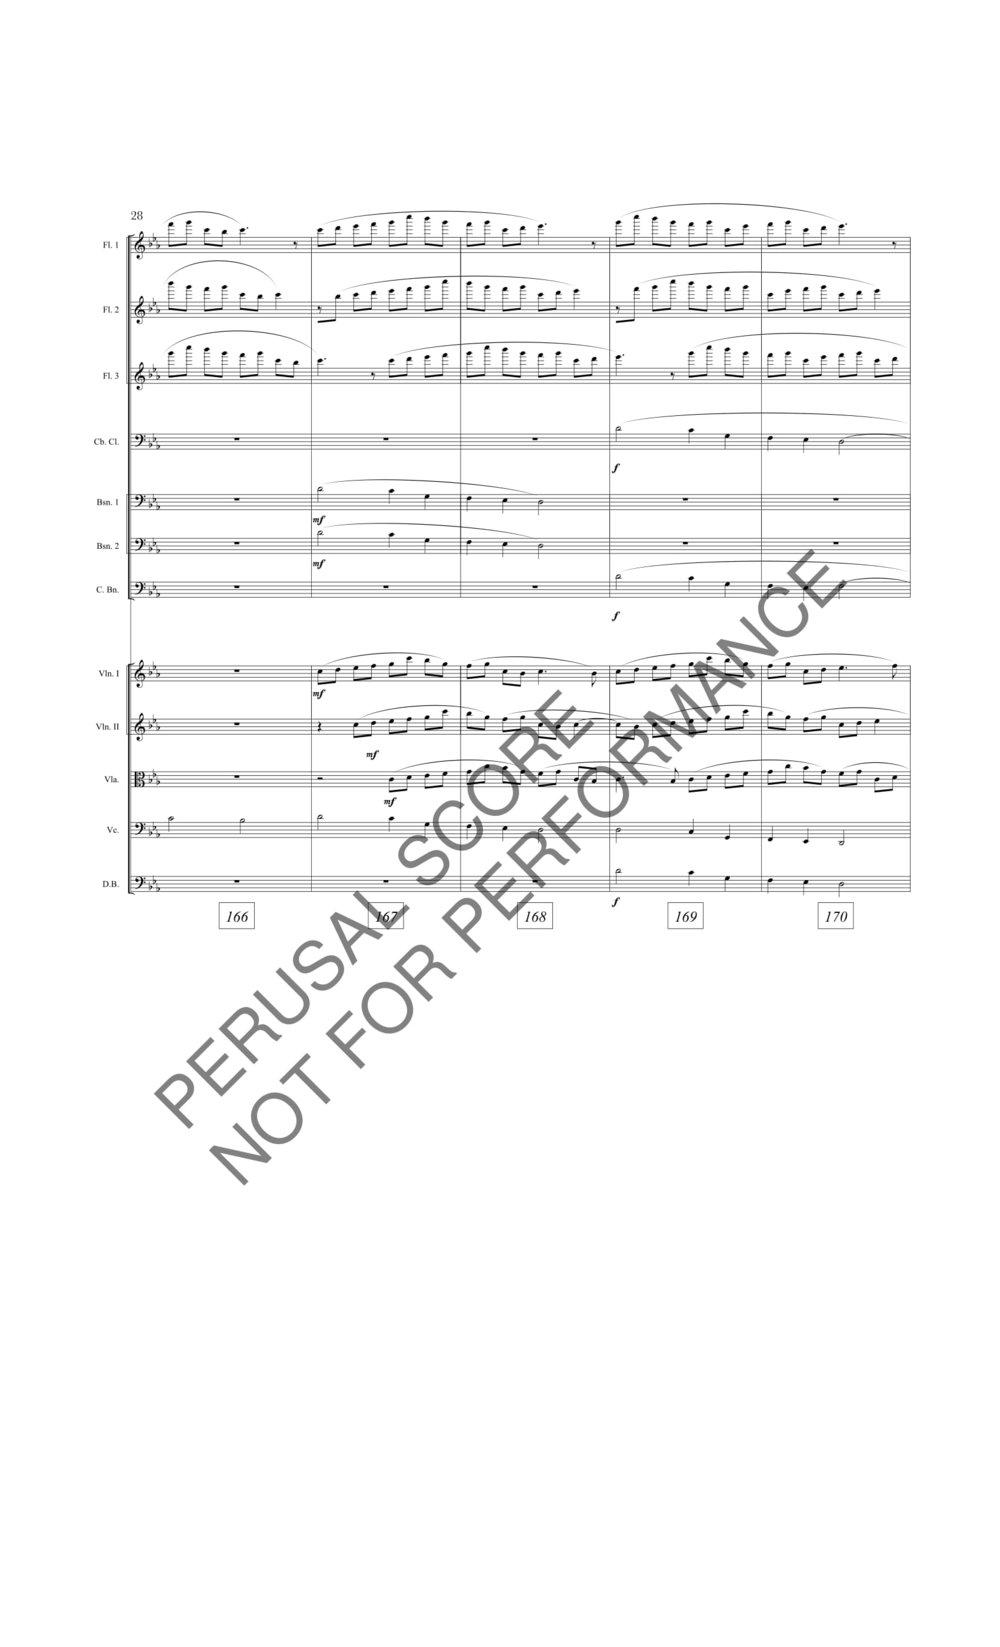 Boyd HouseofFountains Score-watermark-34.jpg